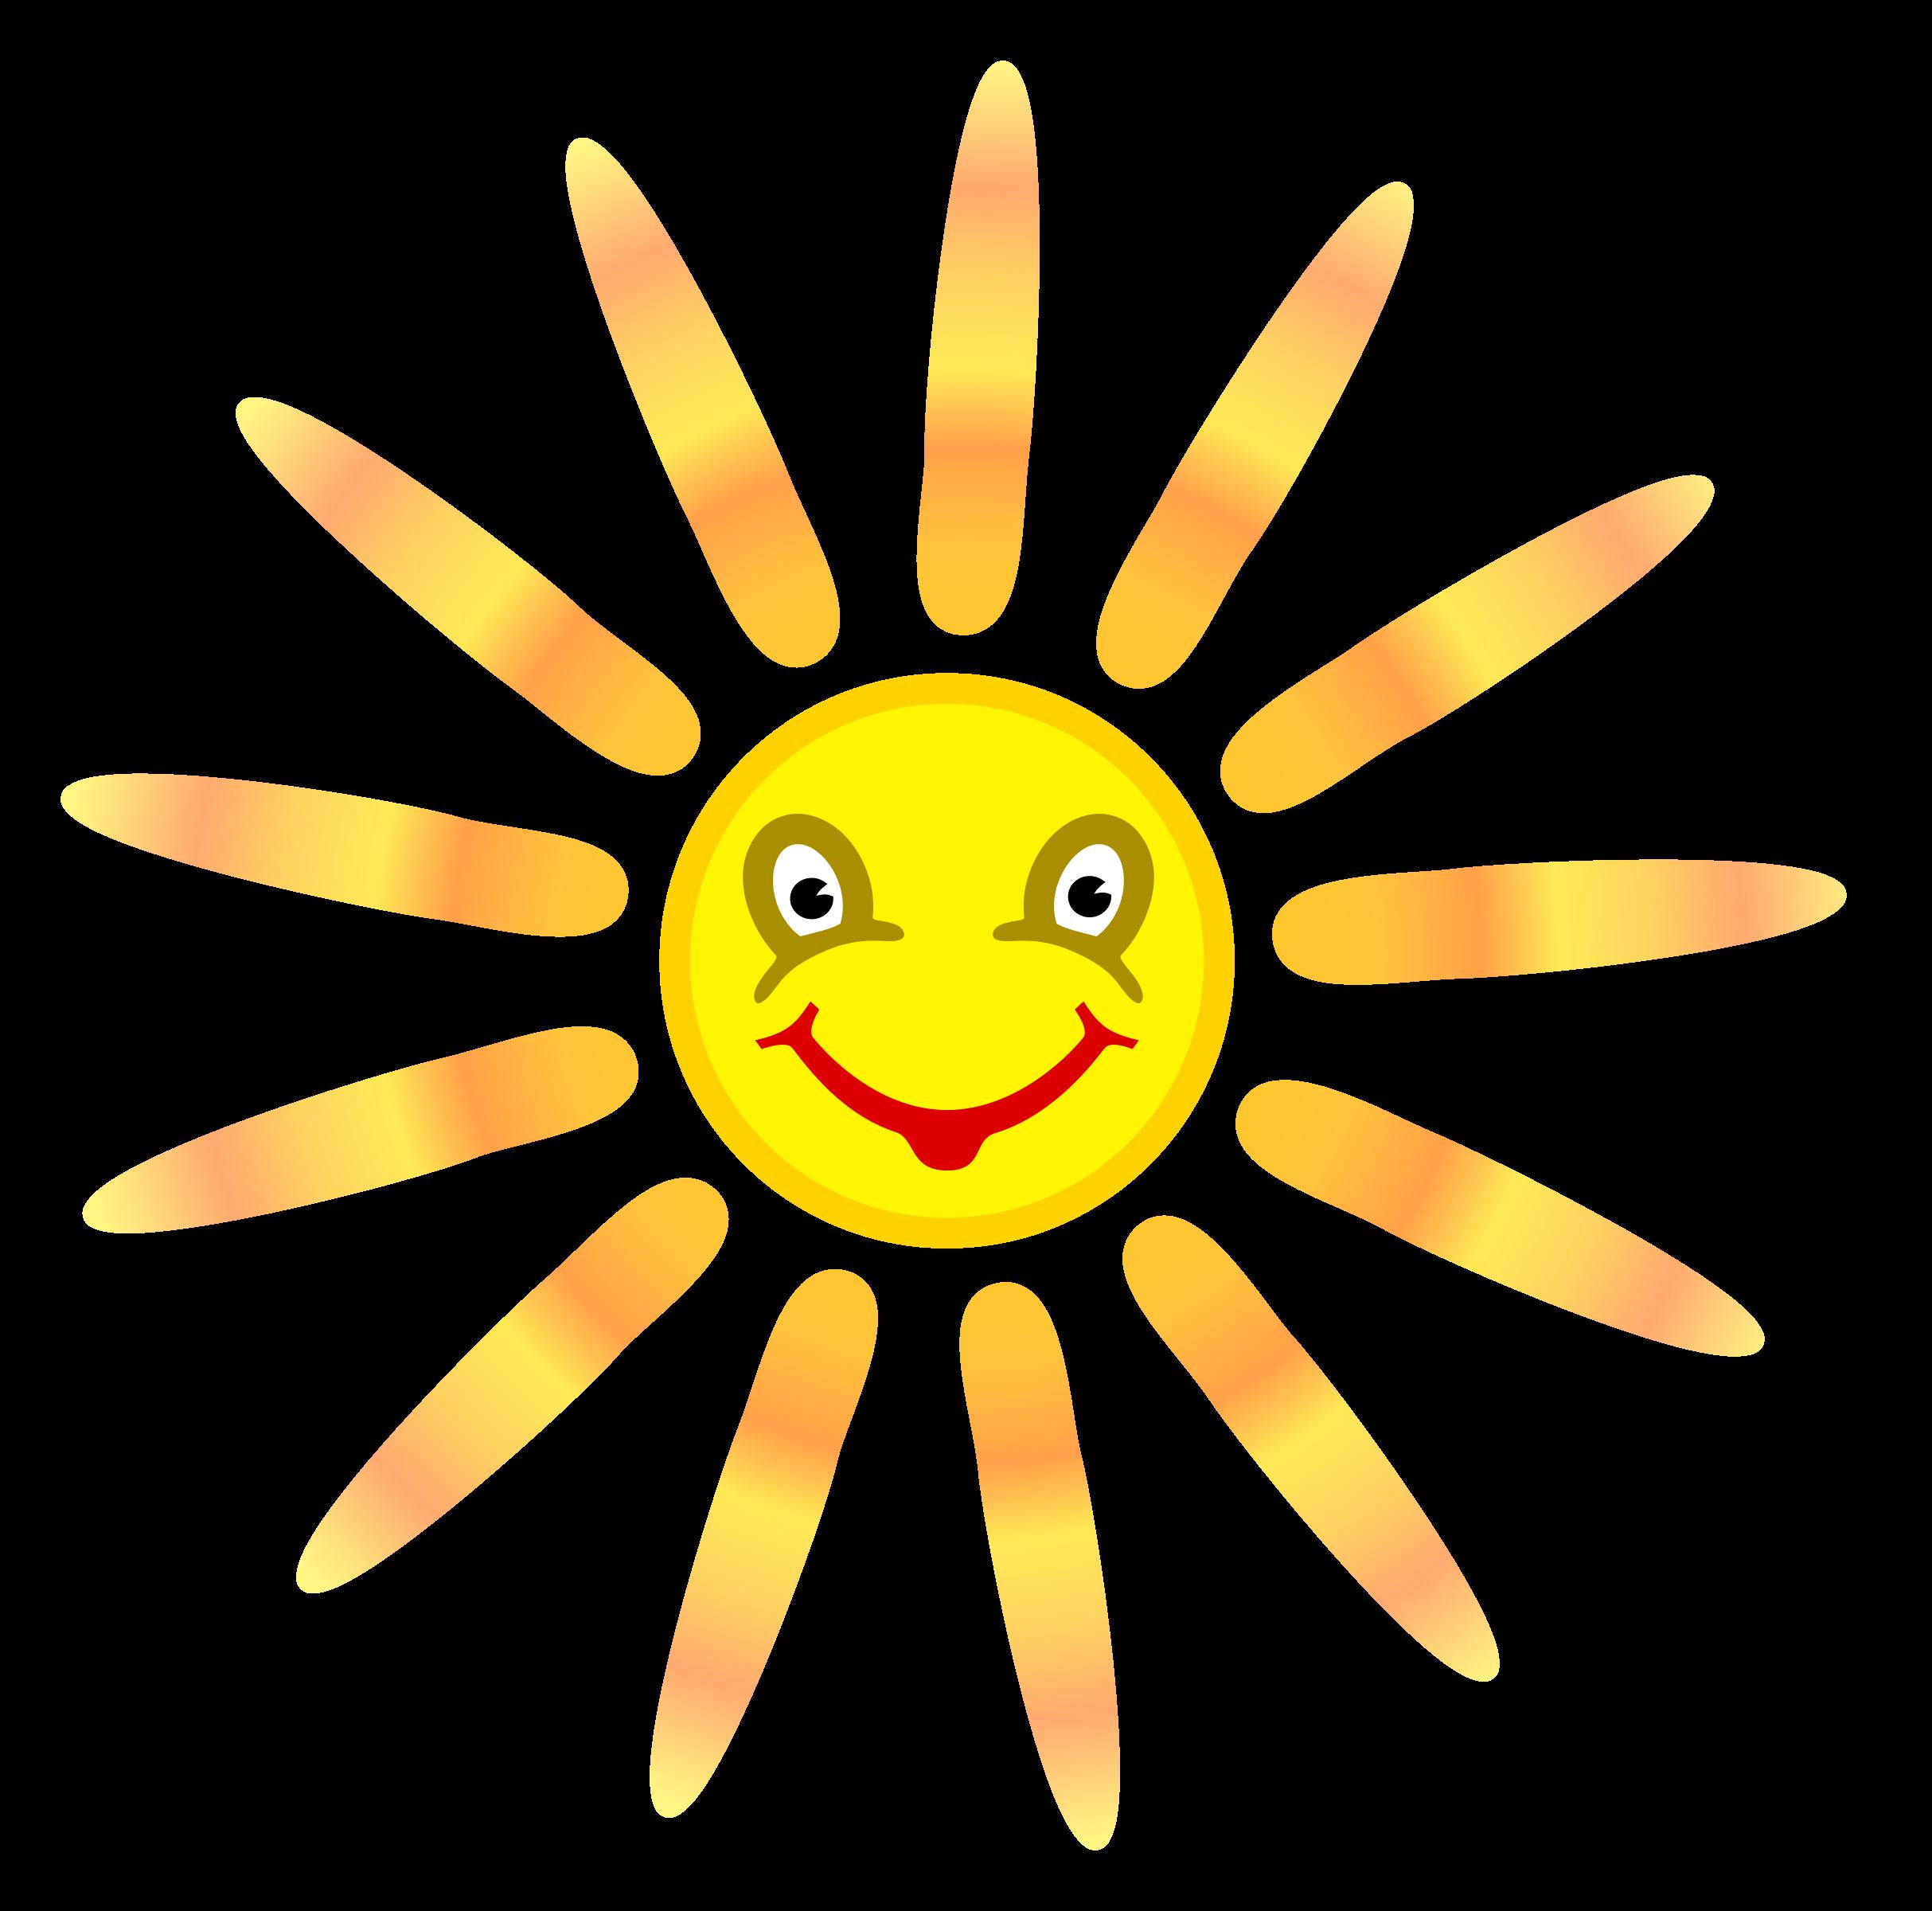 Clipart sun pdf. Coloured big image png